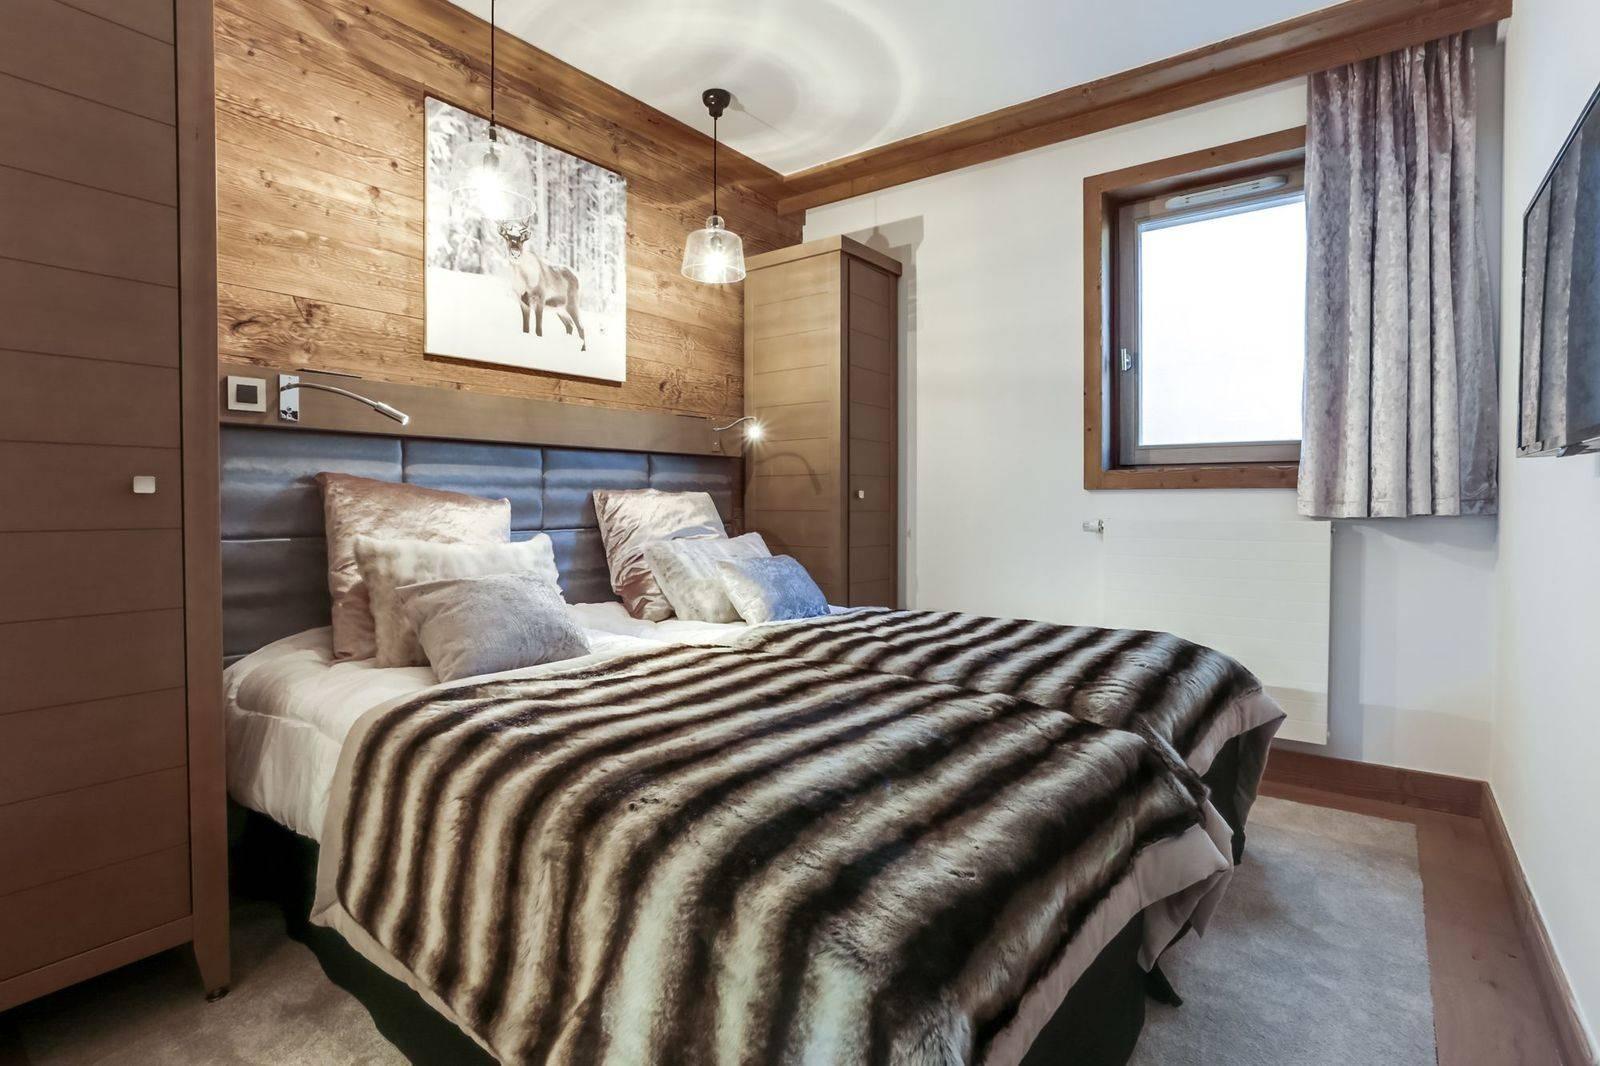 Courchevel 1550 Luxury Rental Appartment Telikia Bedroom